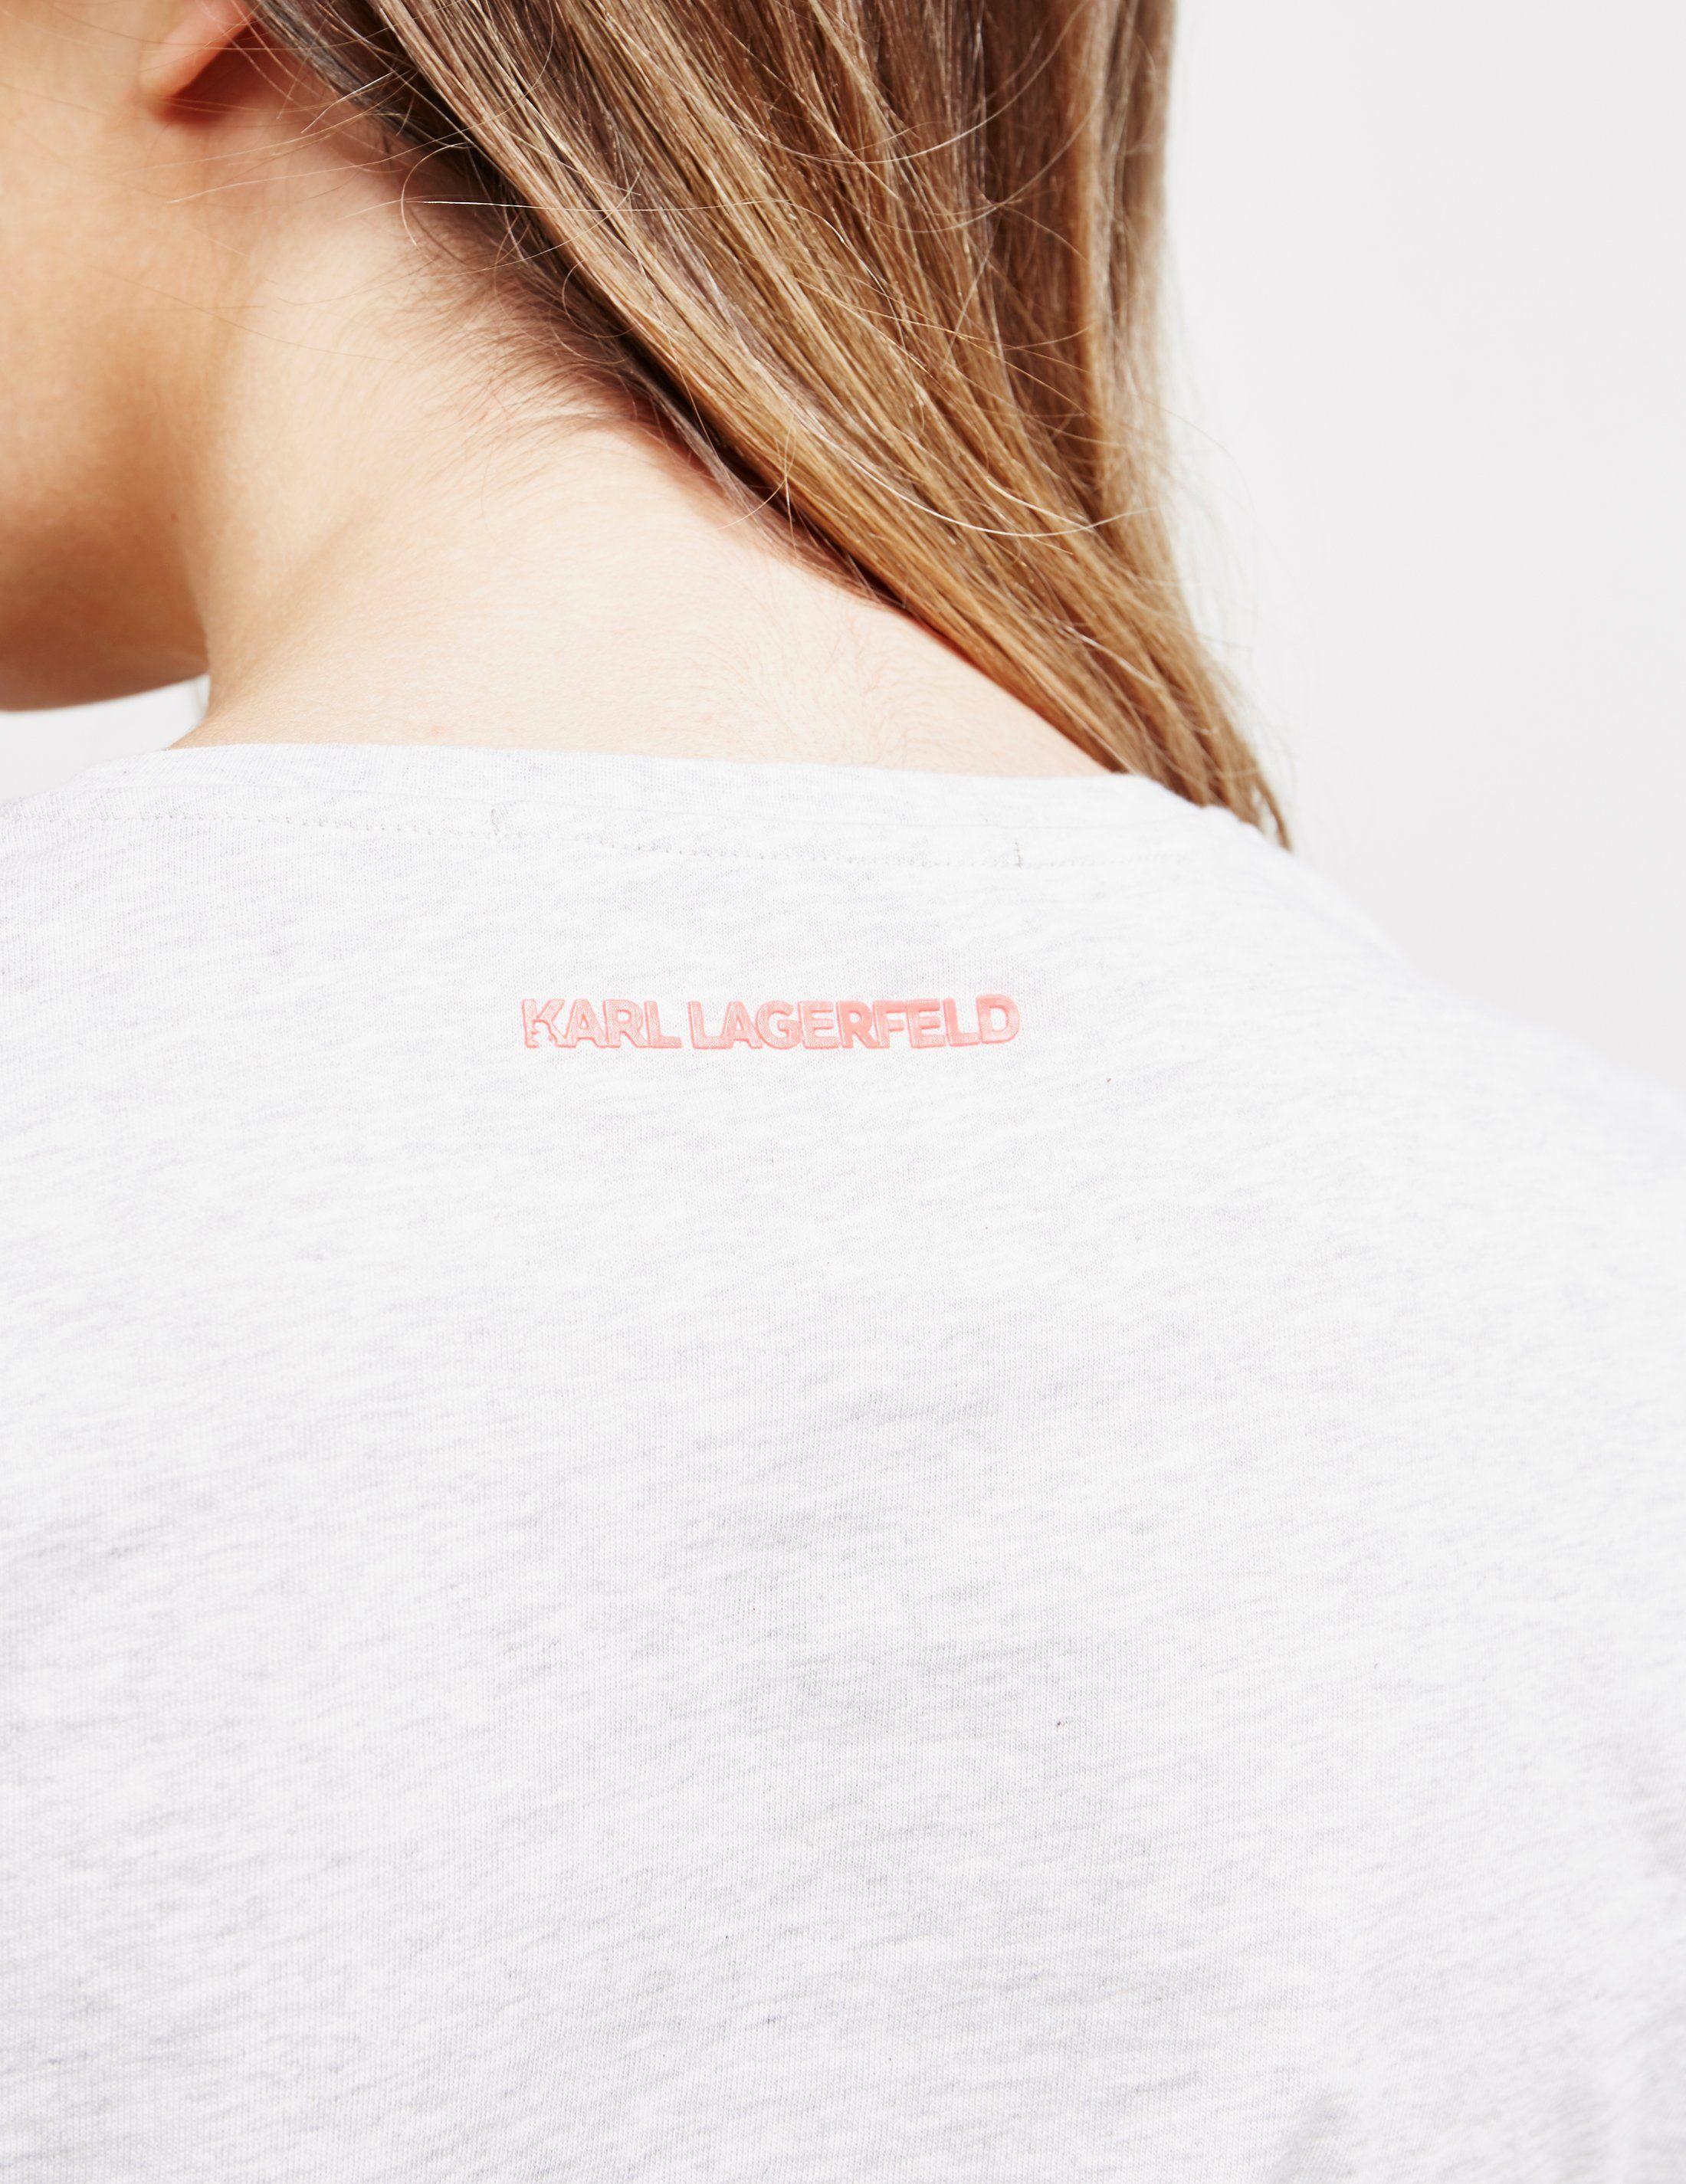 Karl Lagerfeld Ikon Bolt Short Sleeve T-Shirt